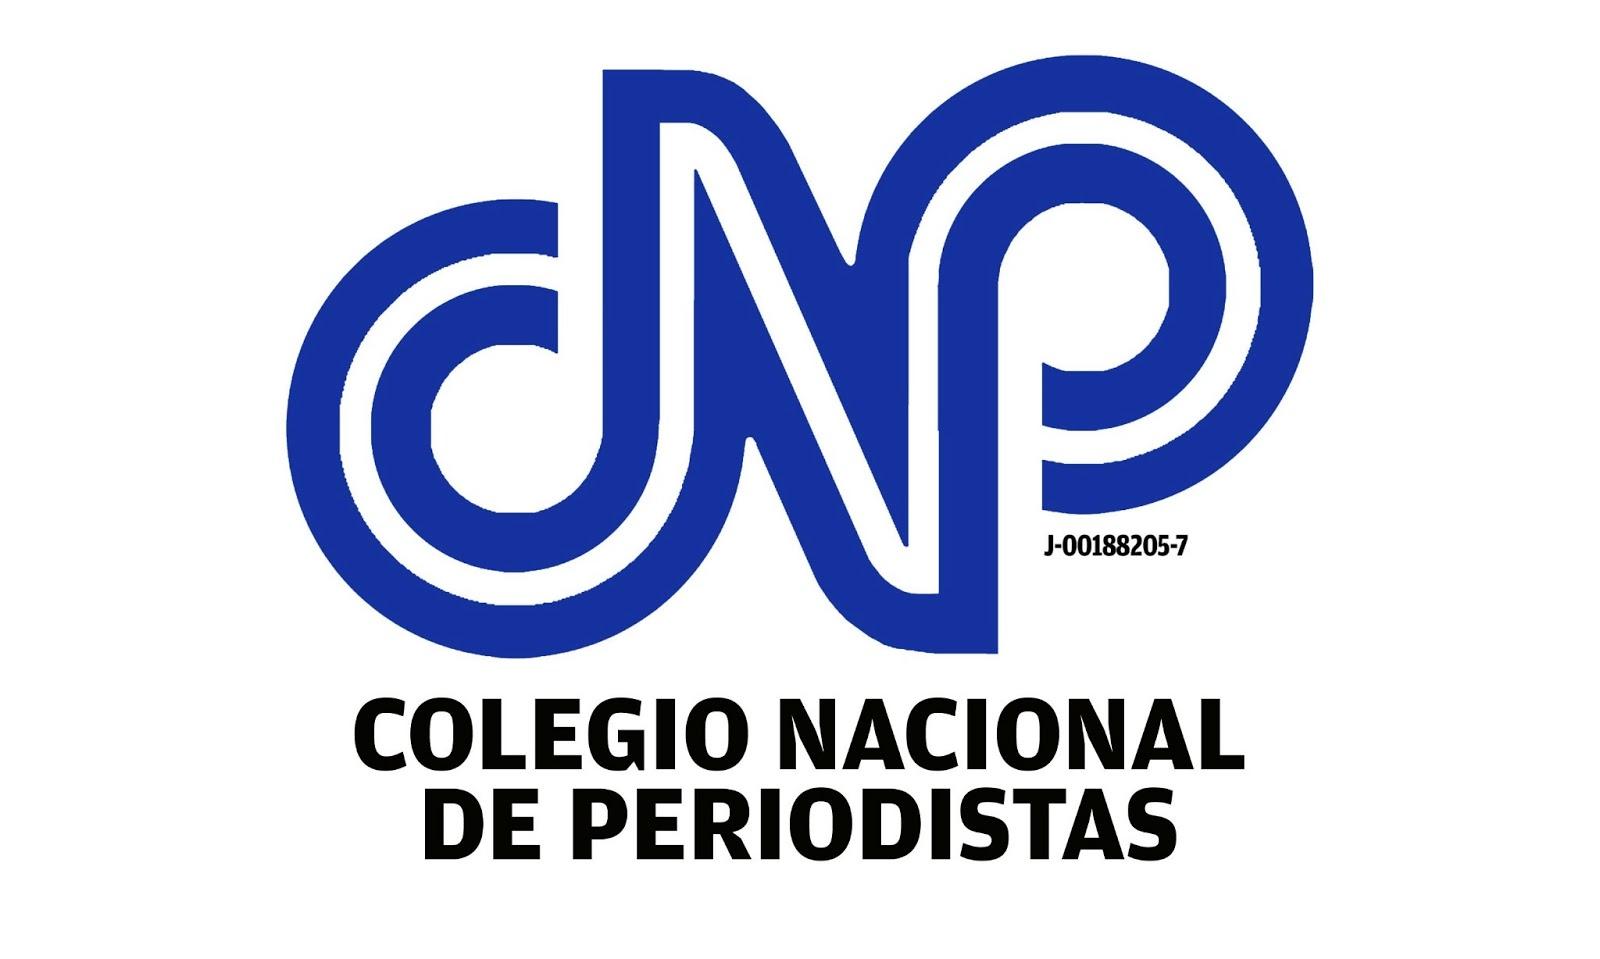 LOGO-CNP-1.jpg